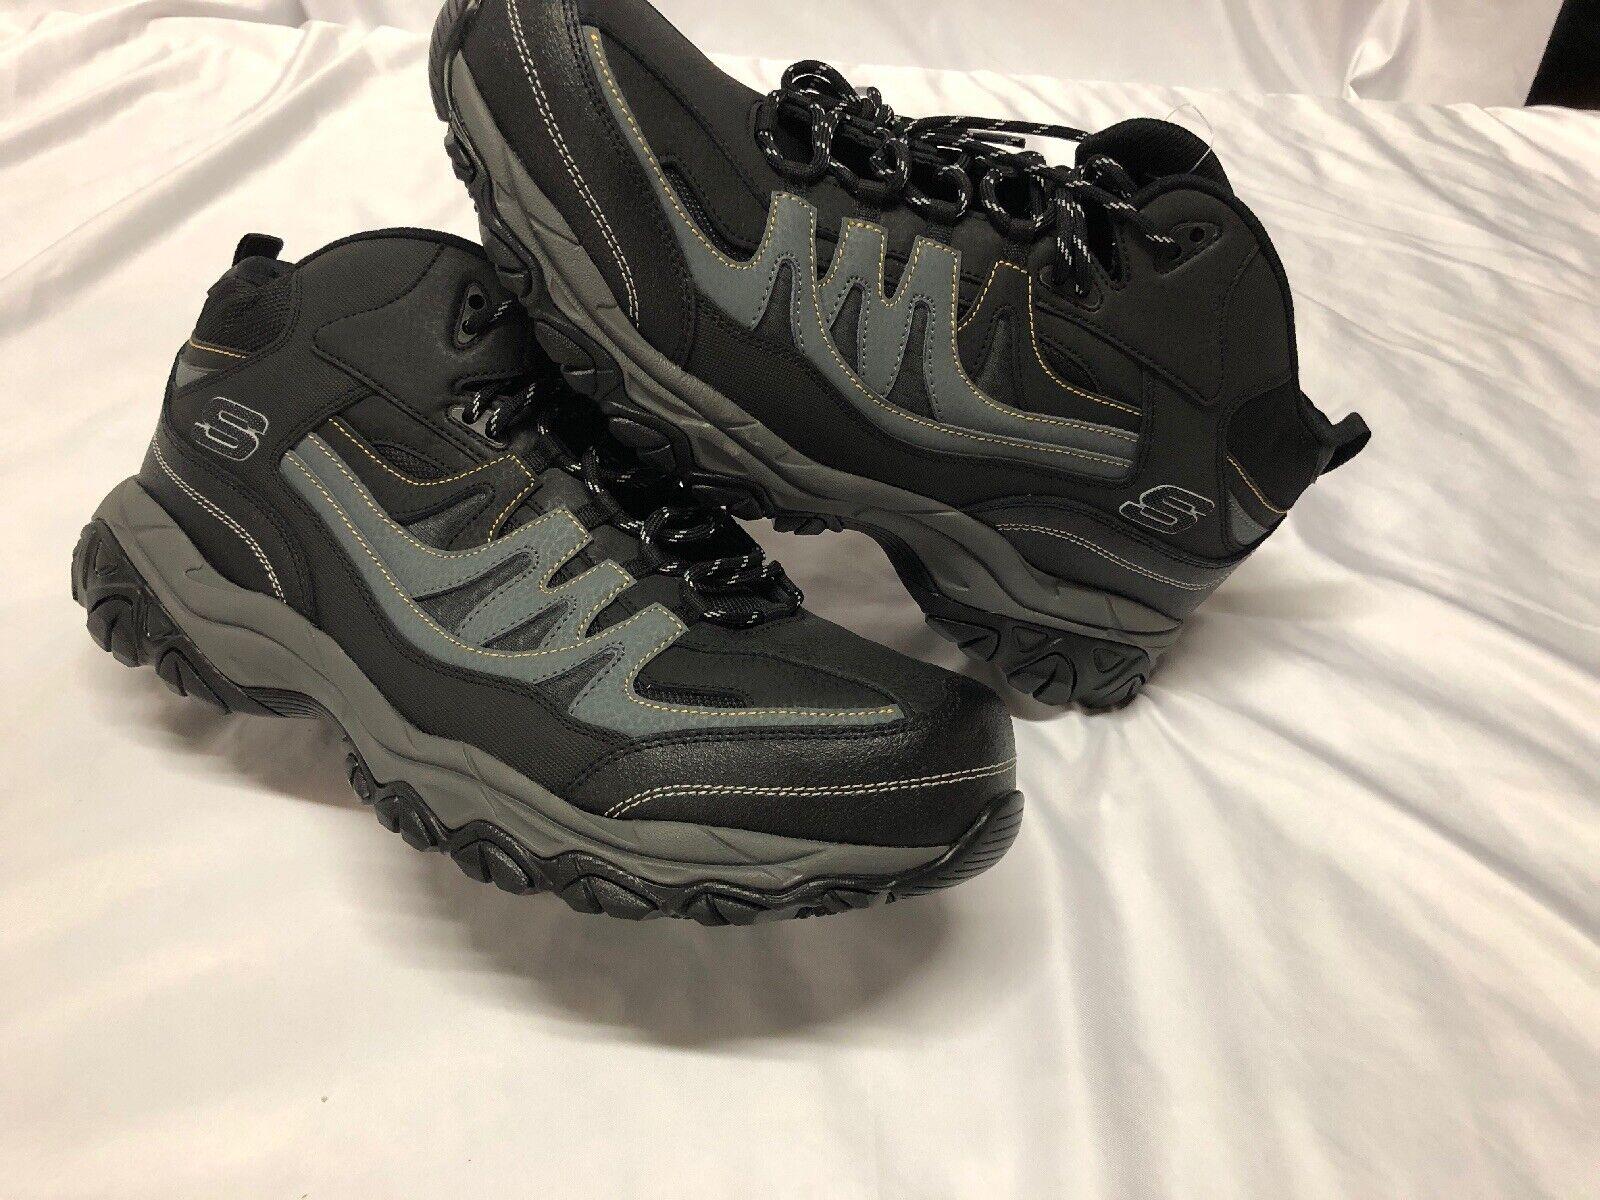 Steel 65533;65533s comfortable männer Größe Skchers Toe, 12